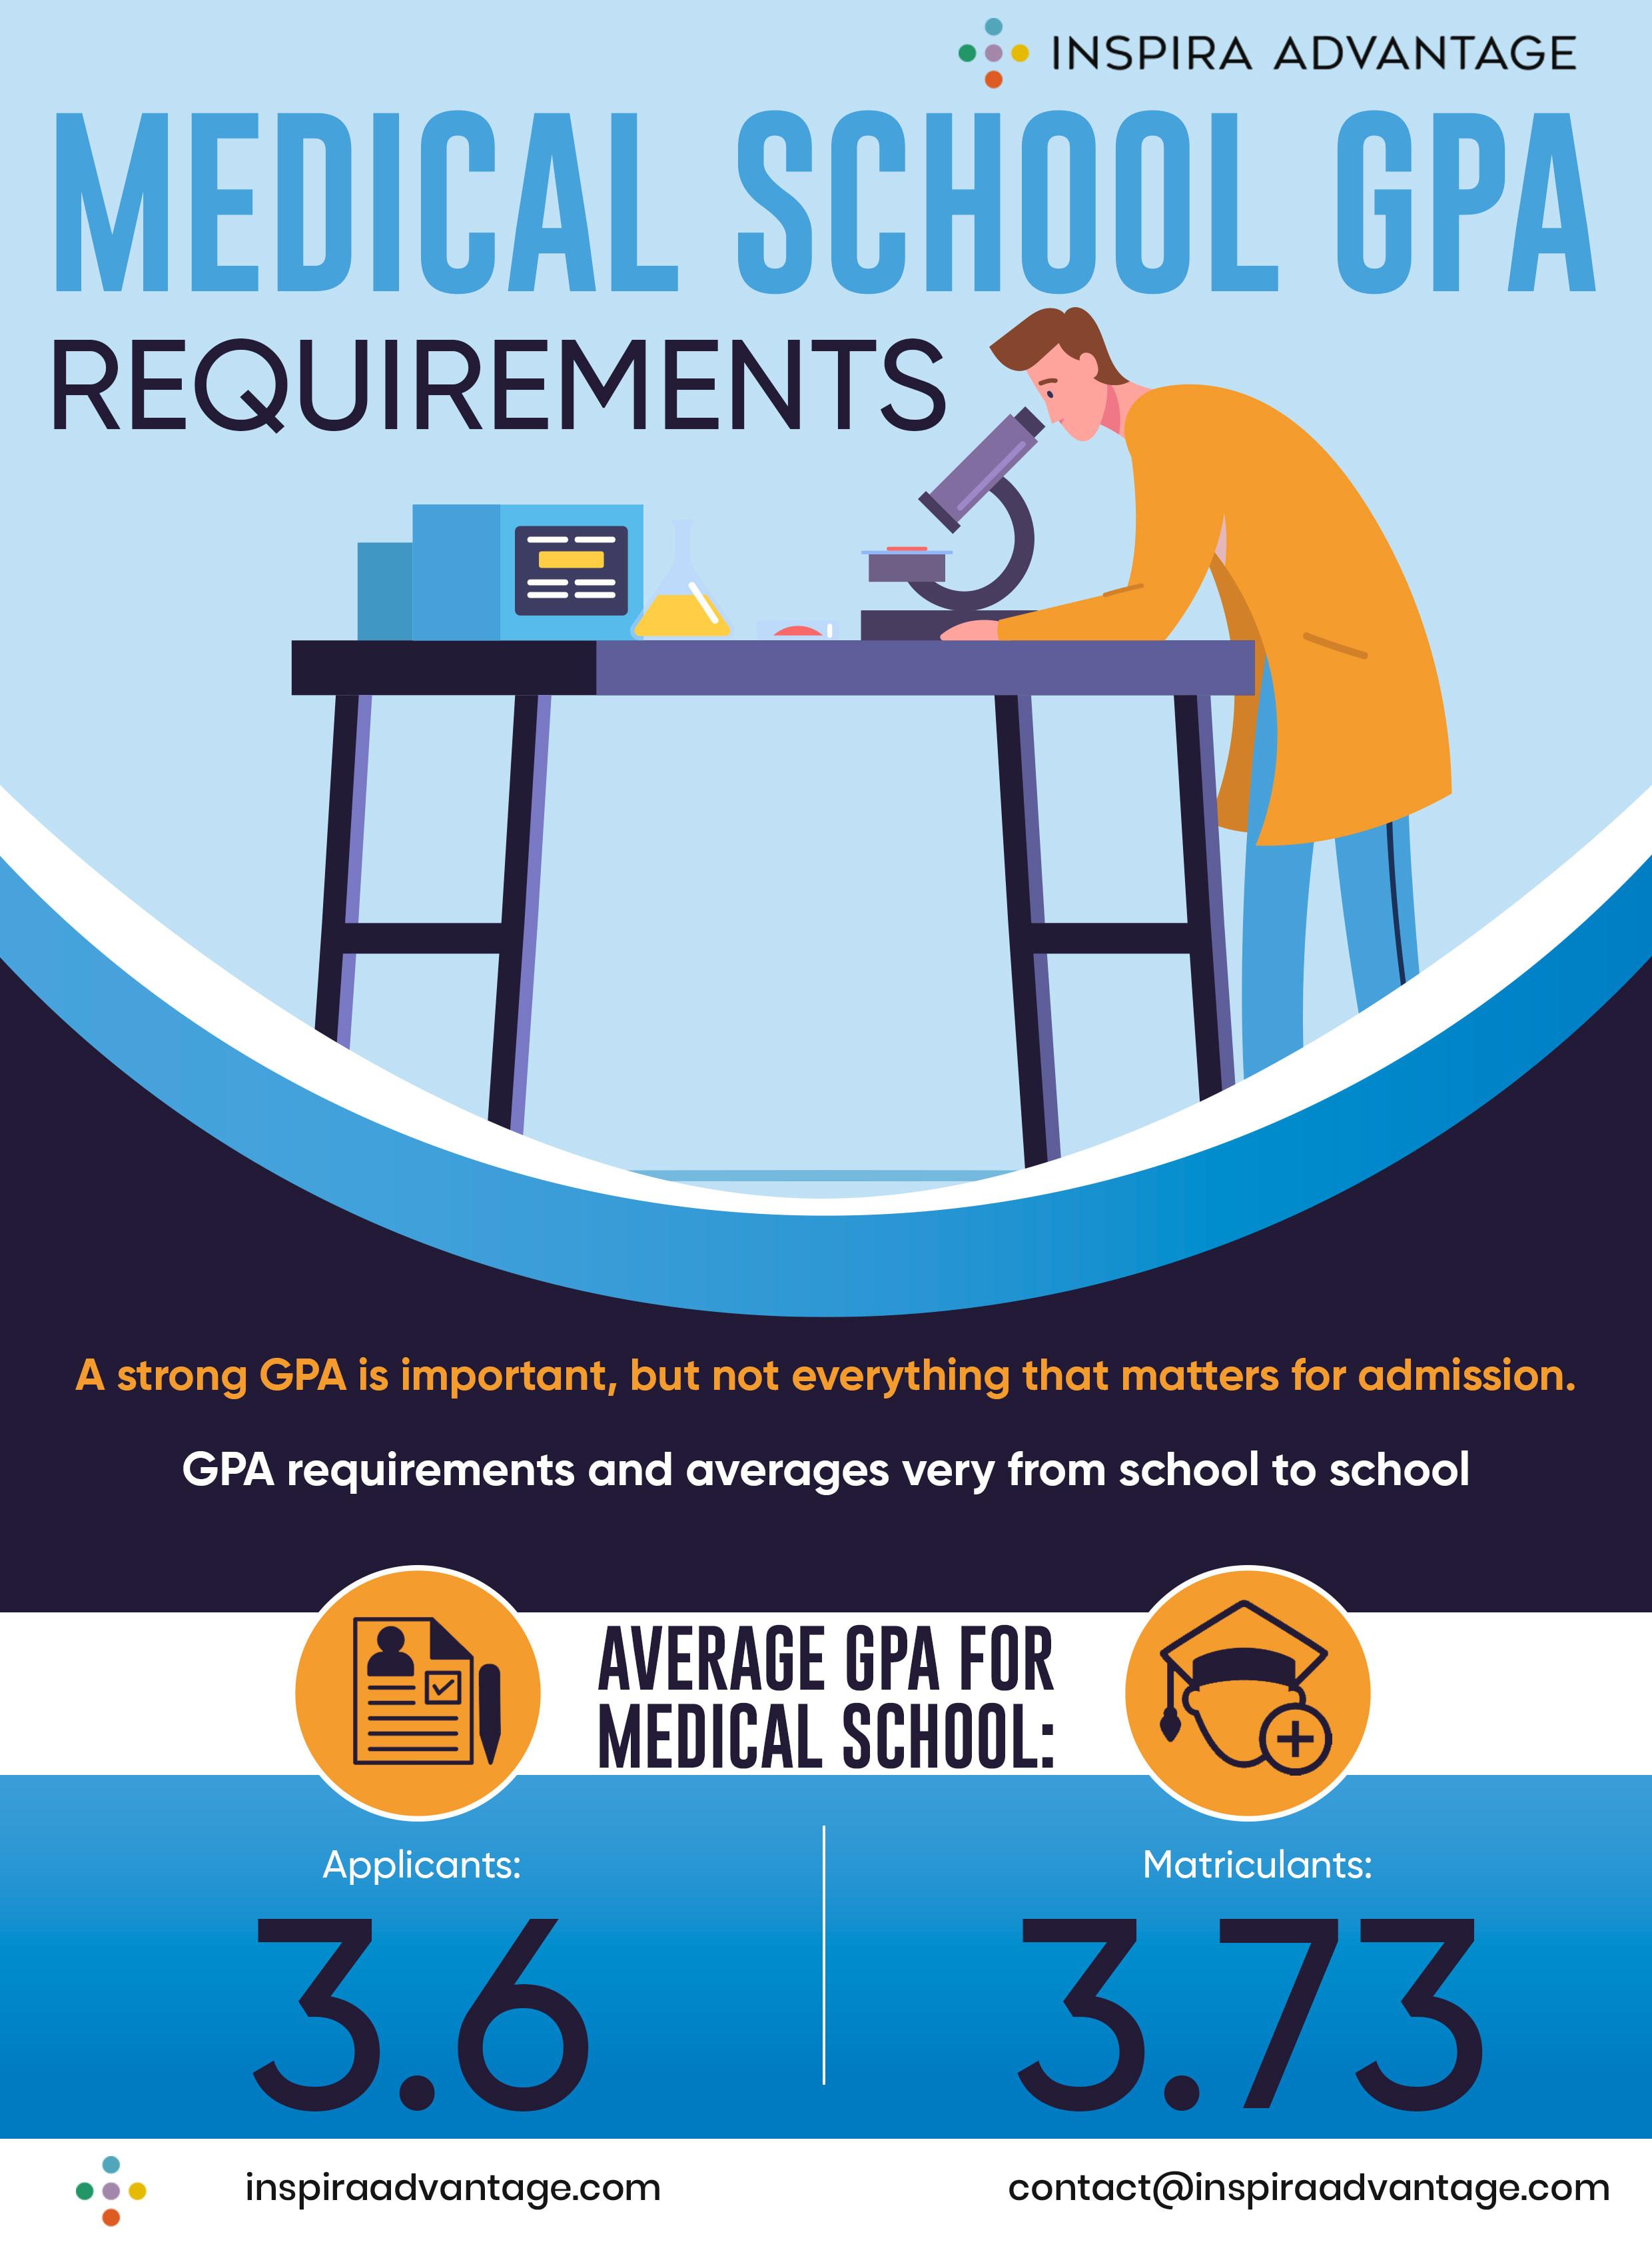 Medical School GPA requirements